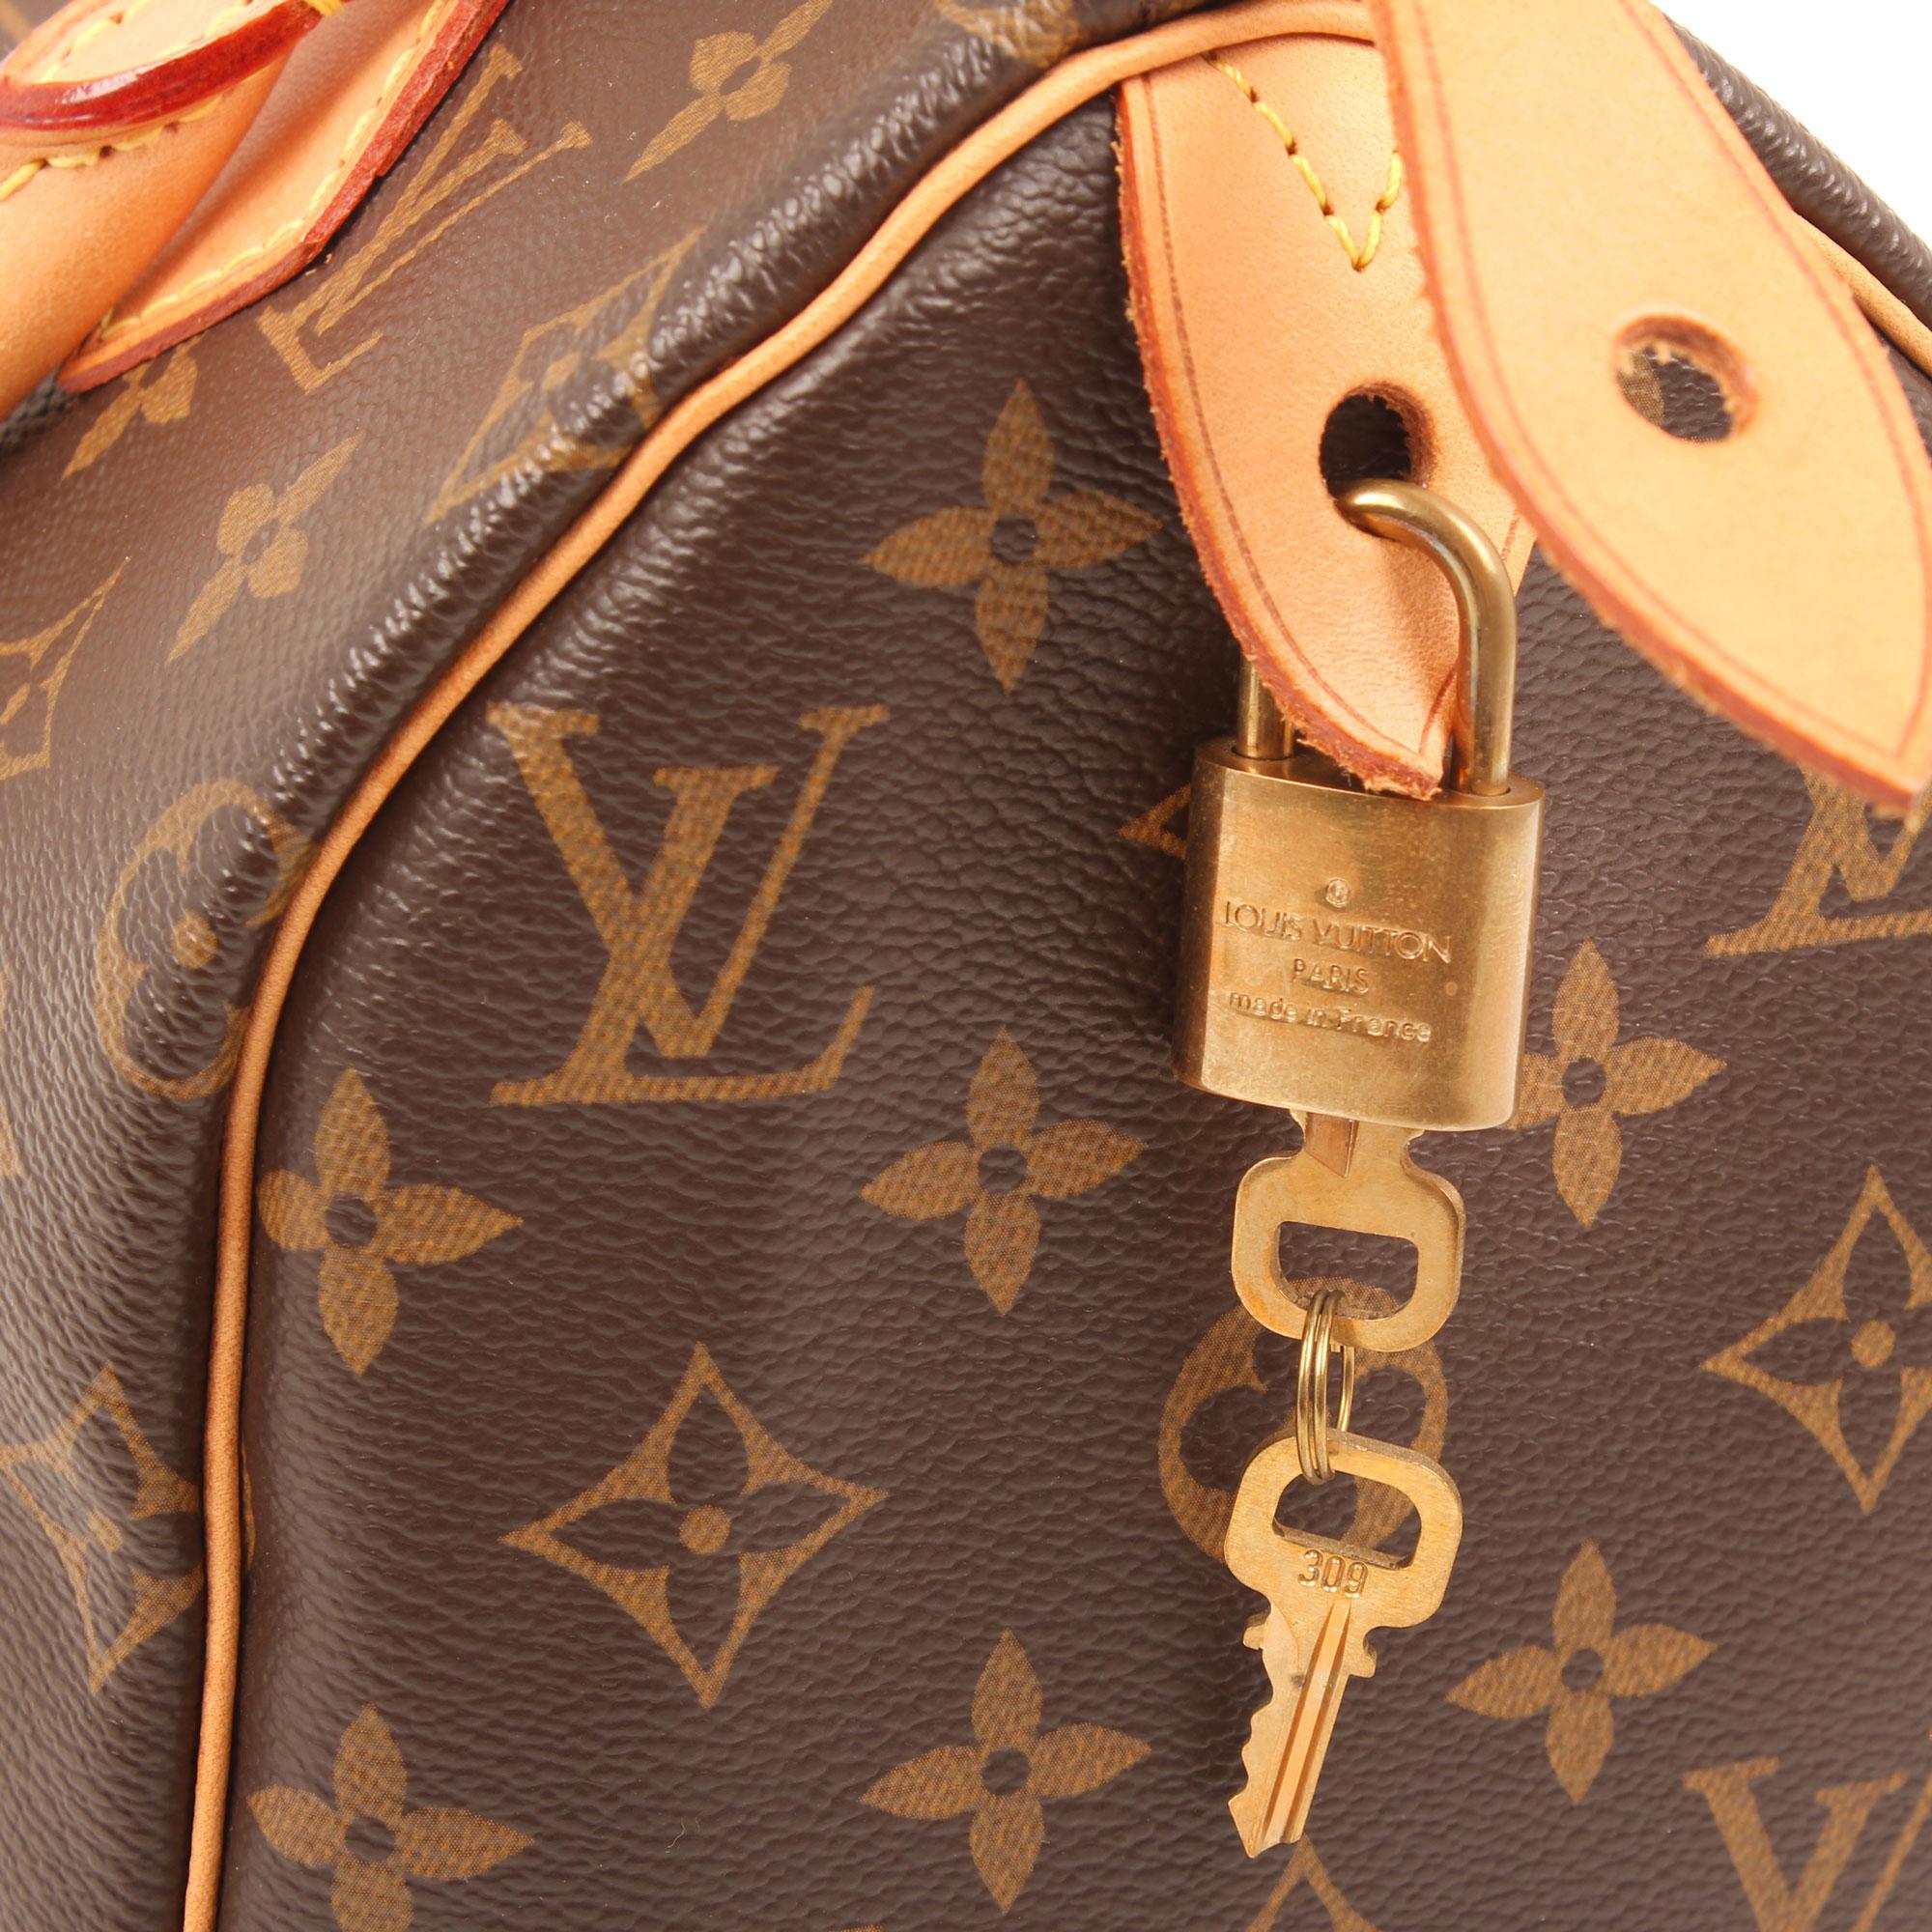 handbag louis vuitton speedy 25 monogram padlock keys